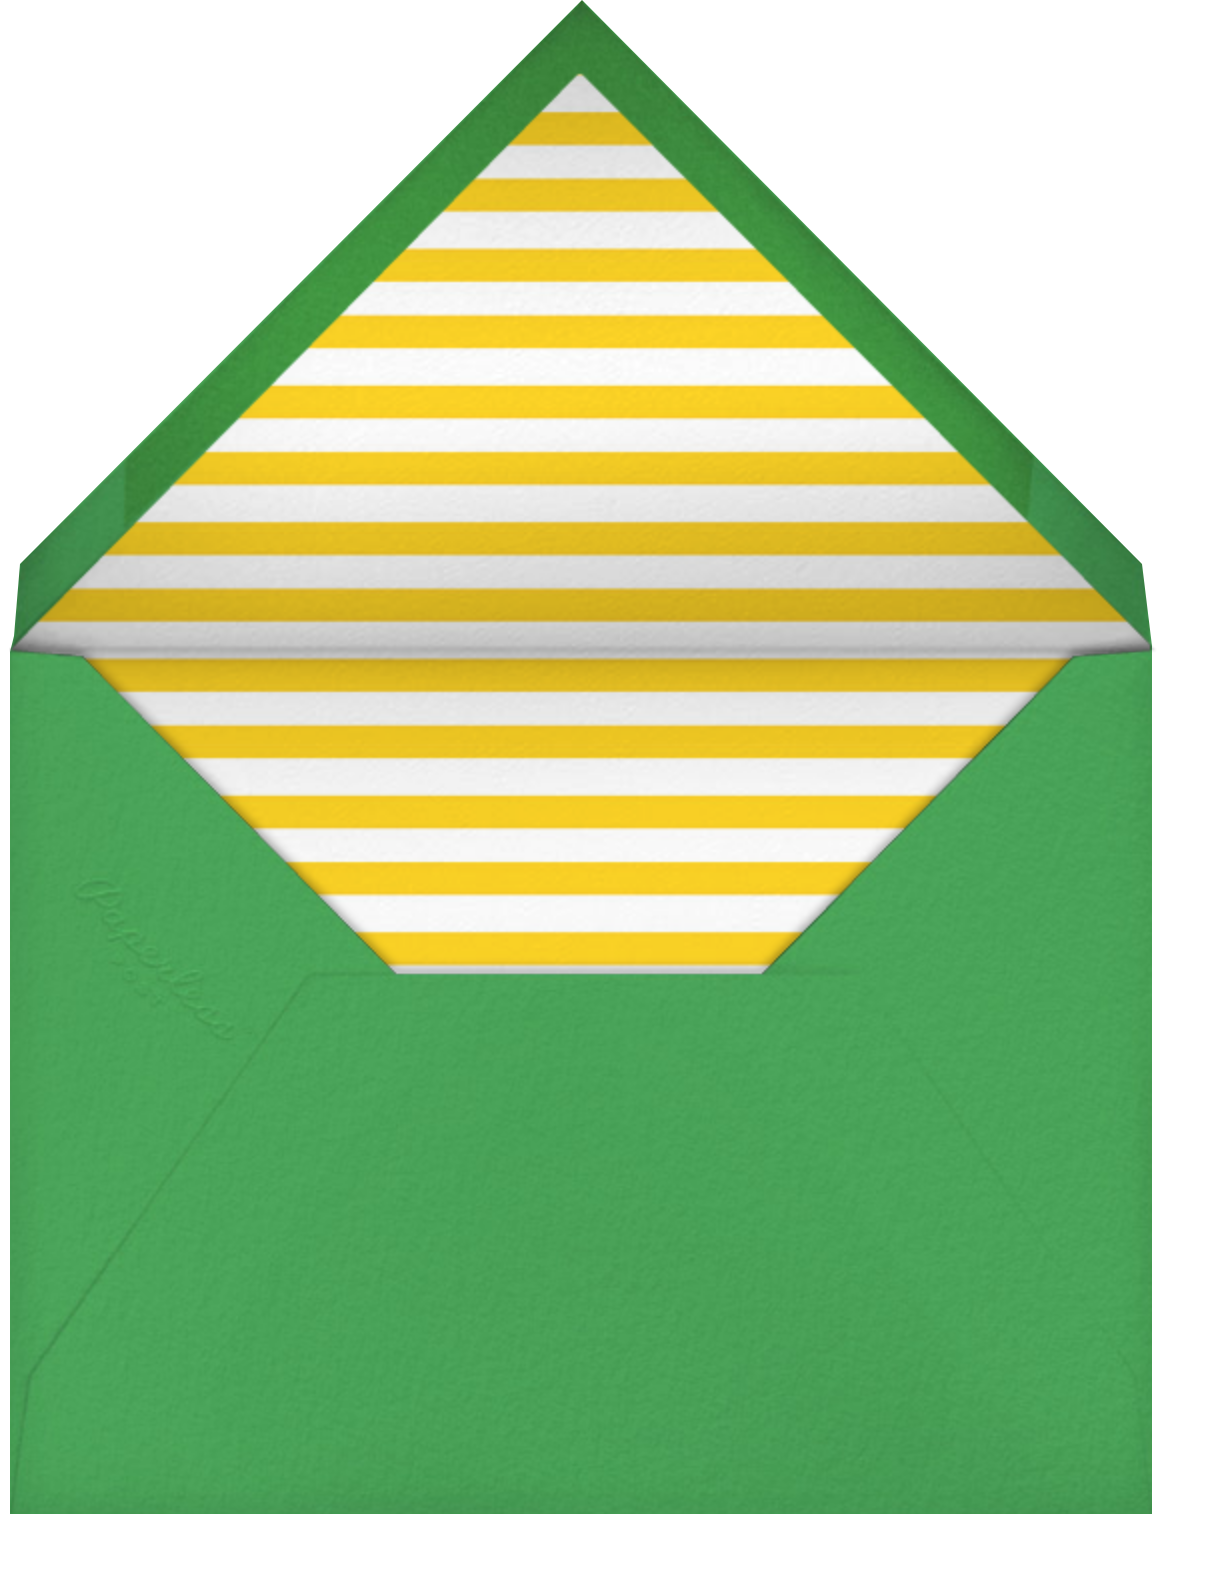 Welcome to Our New Home - Mr. Boddington's Studio - Housewarming - envelope back